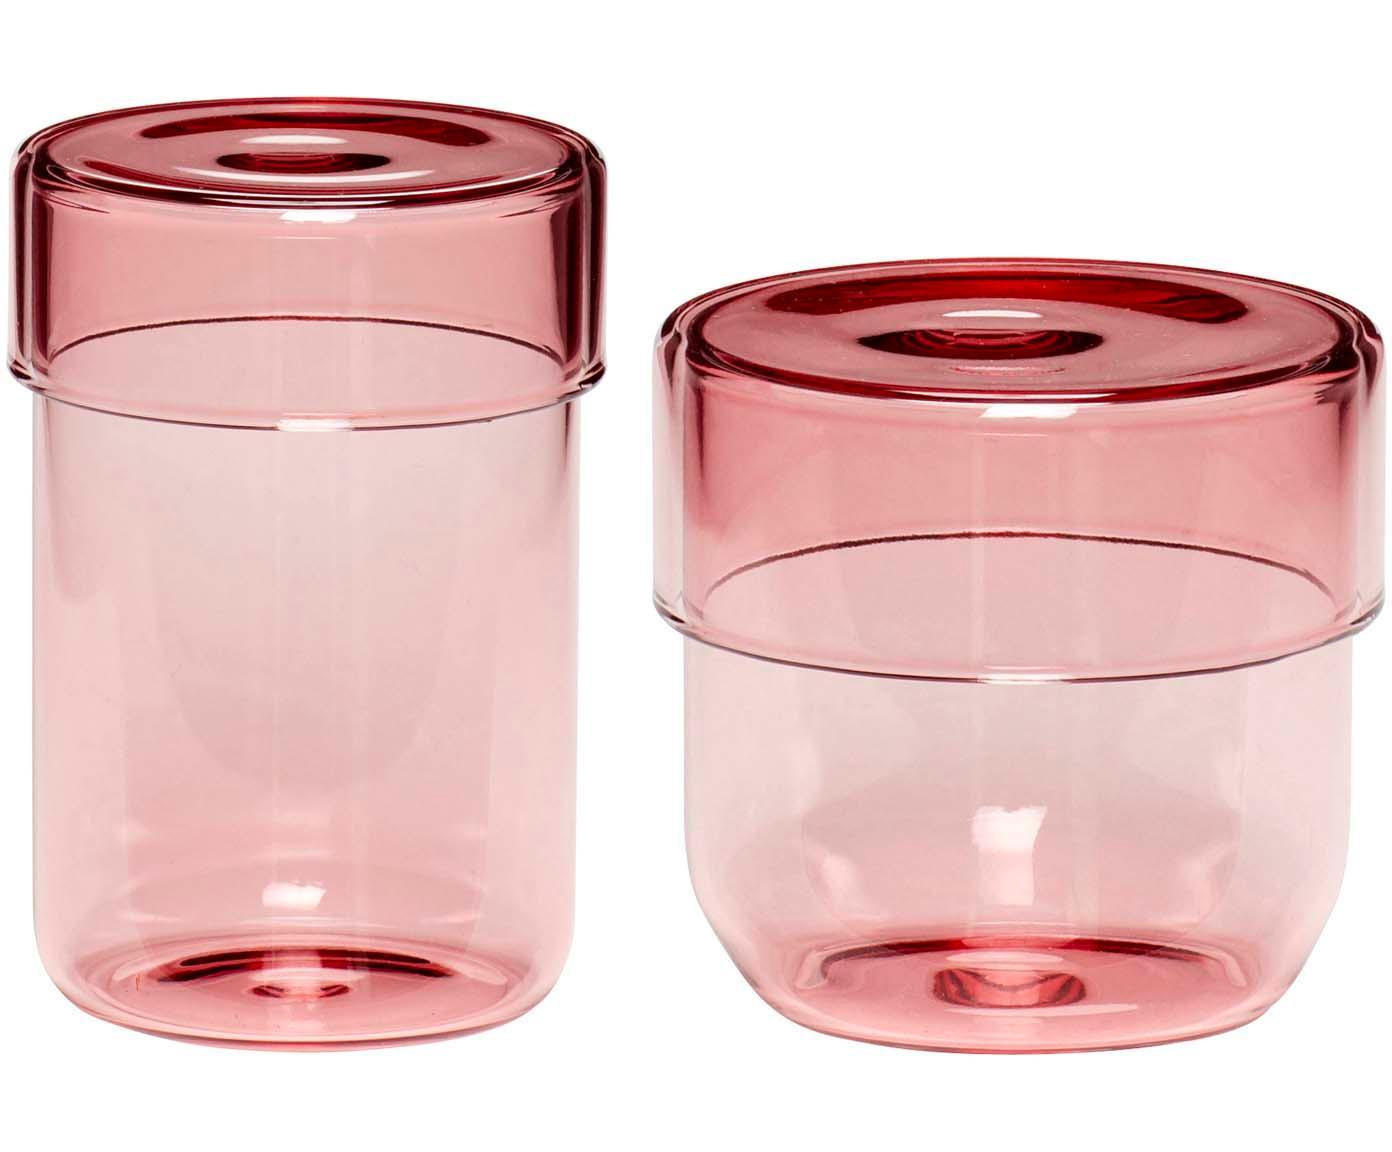 Opbergpottenset Transisto, 2-delig, Glas, Roze, Dozenset M